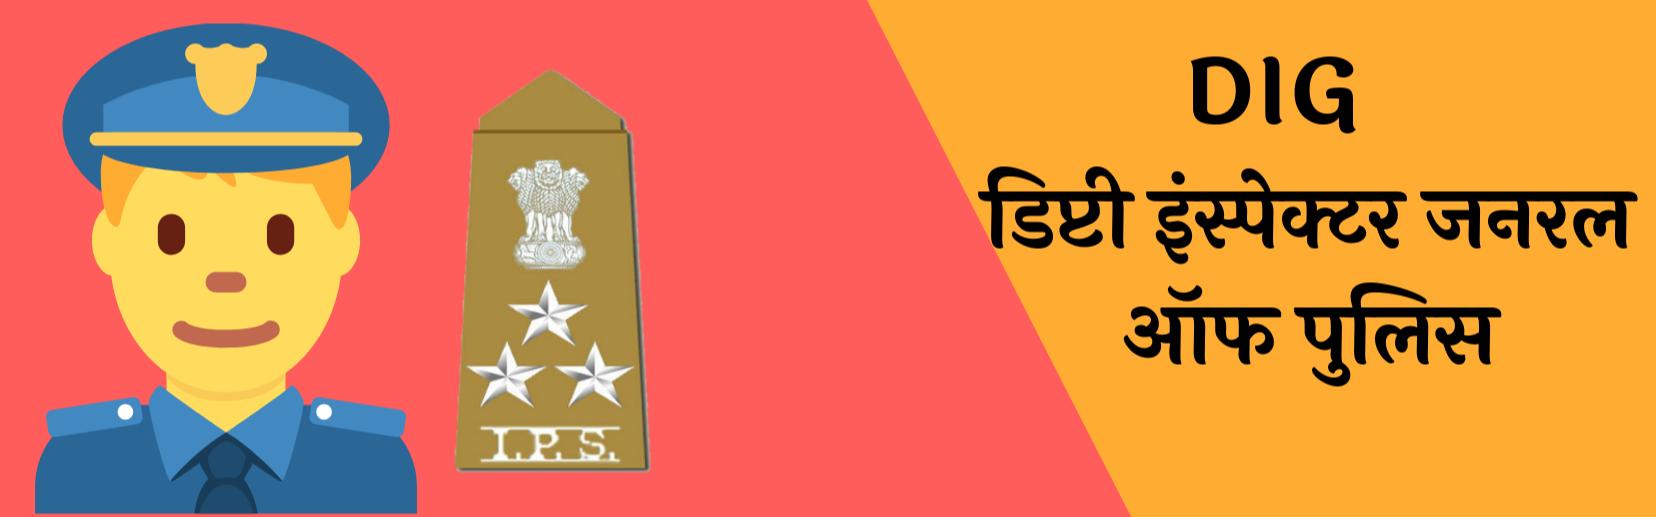 DIG rank list hindi